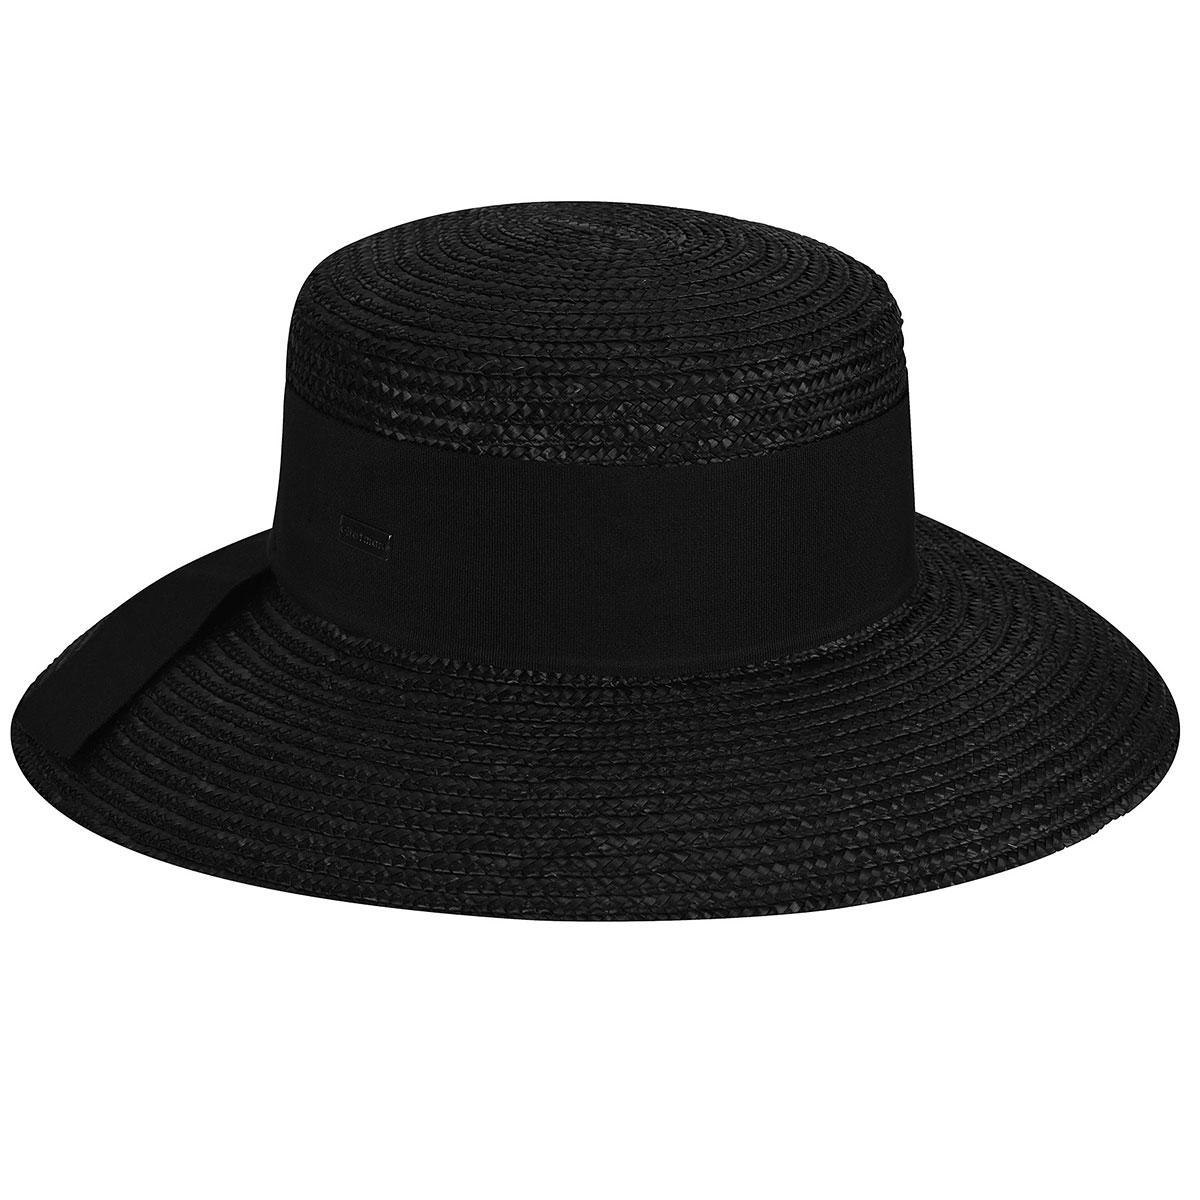 Women's Vintage Hats | Old Fashioned Hats | Retro Hats Riviera Wide Brim Boater $39.00 AT vintagedancer.com